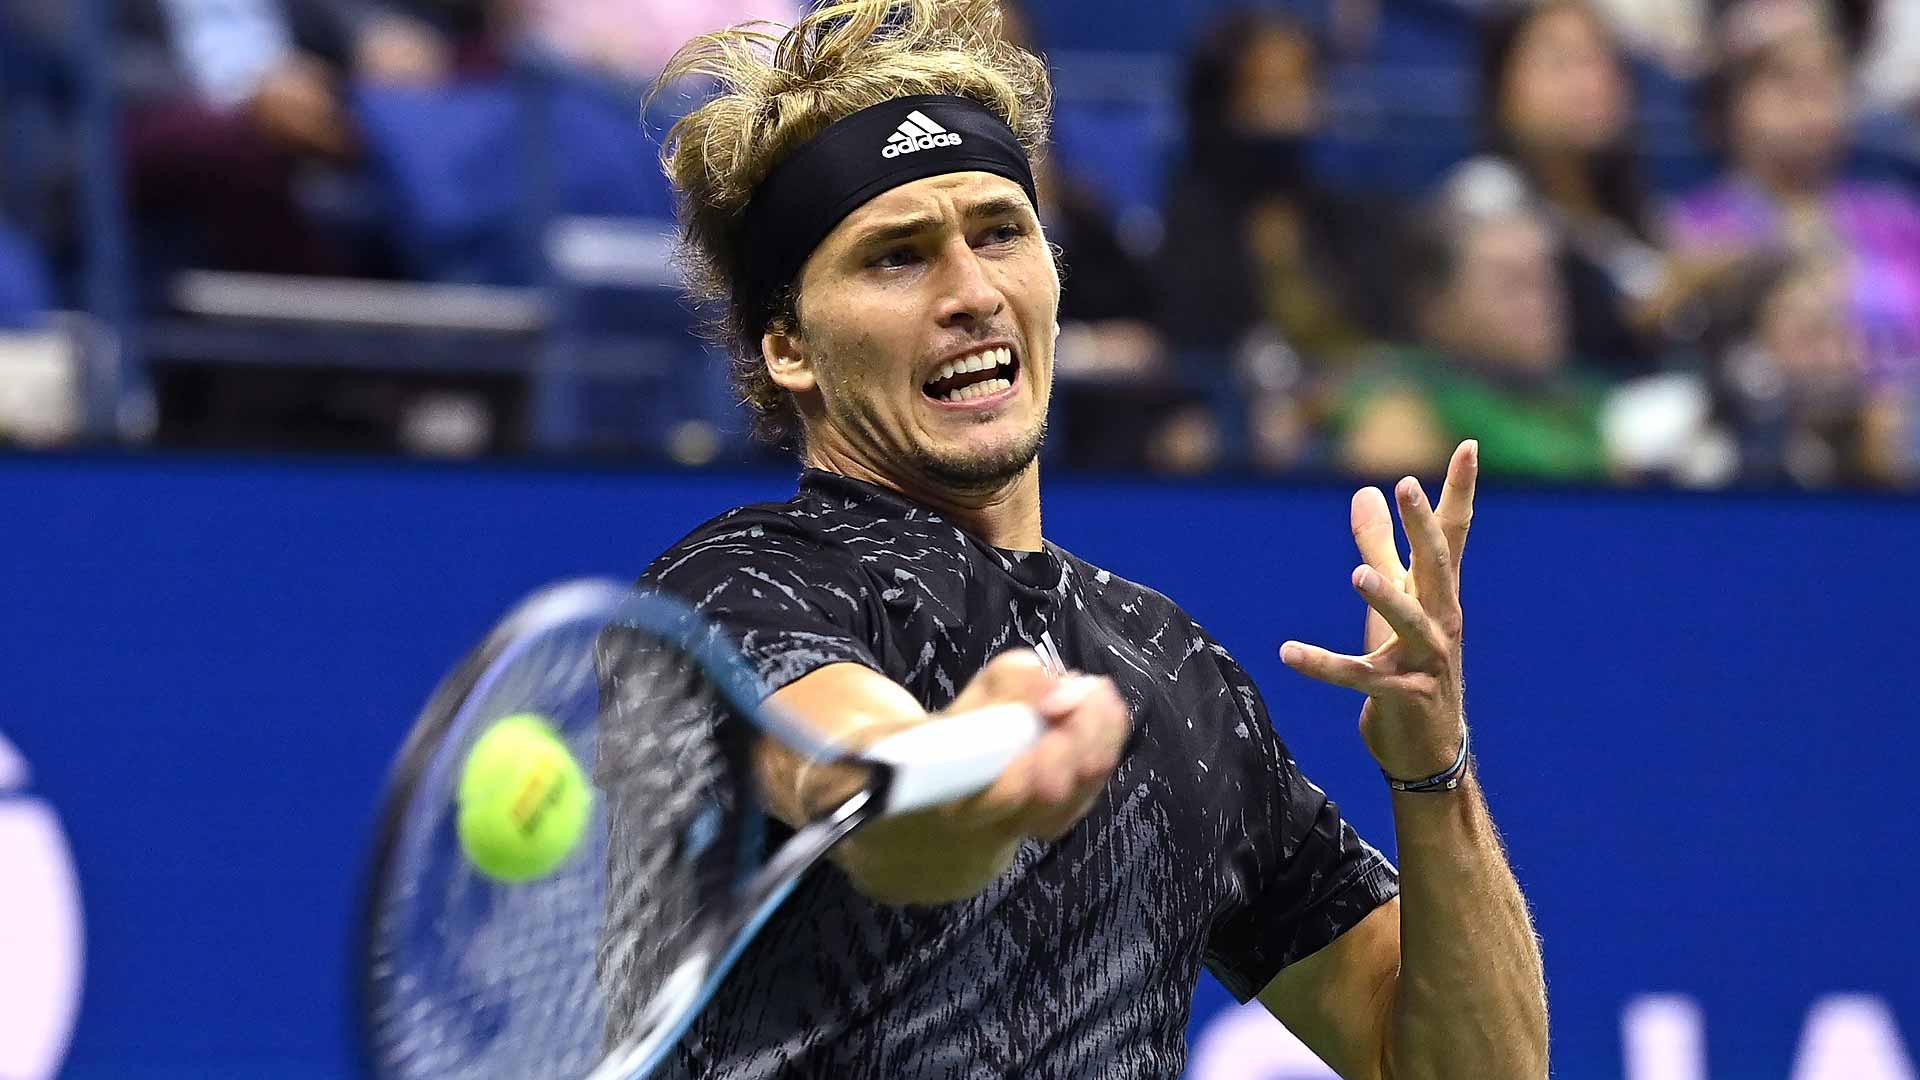 US Open 2021: Alexander Zverev vs. Jannik Sinner Tennis Pick and Prediction